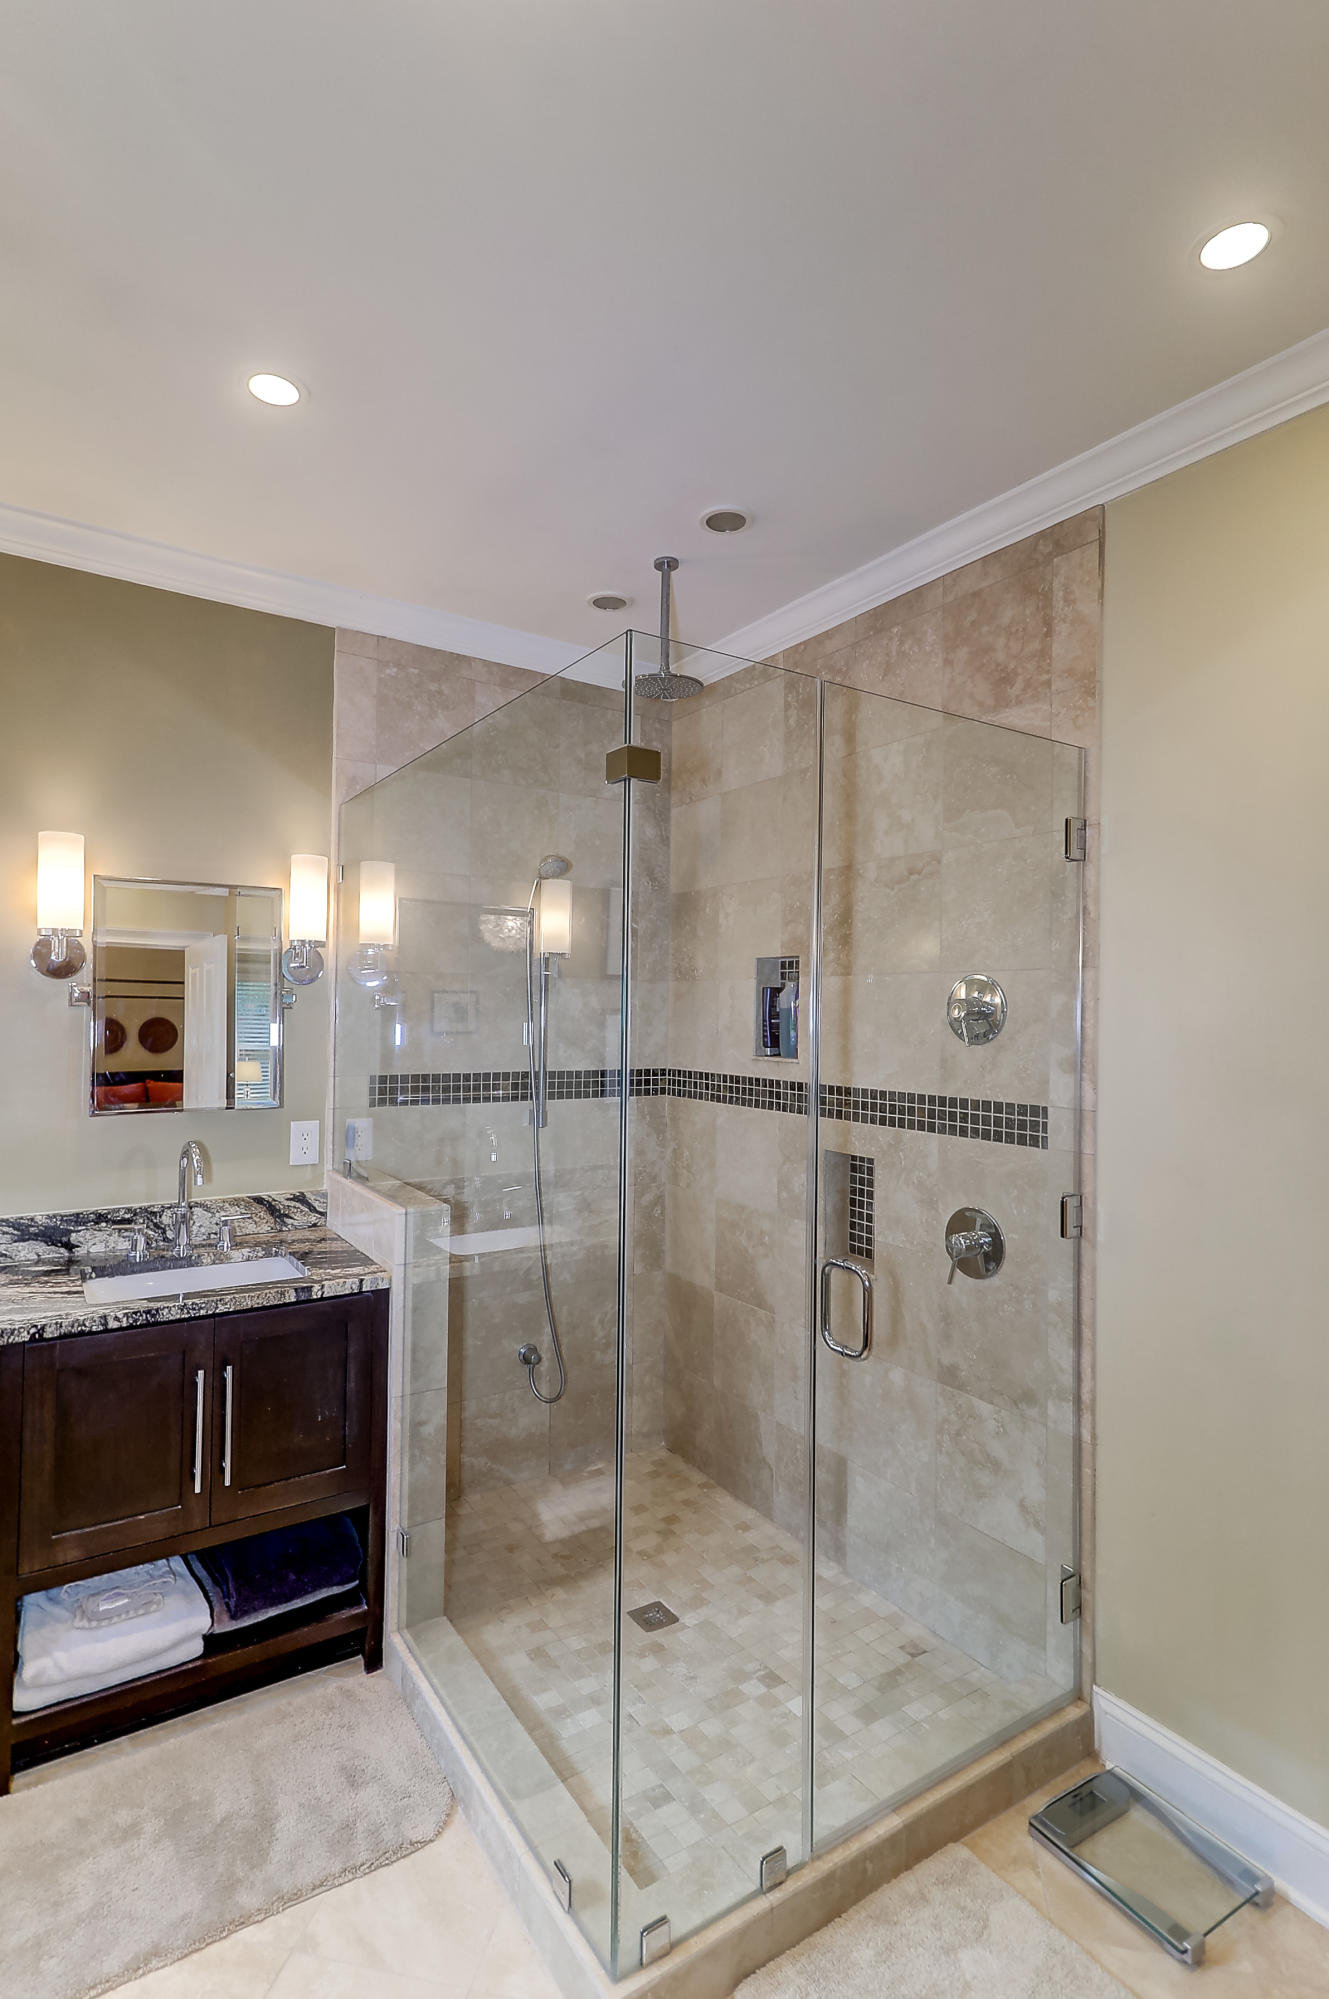 St. Michaels Place Homes For Sale - 658 Lake Frances, Charleston, SC - 38